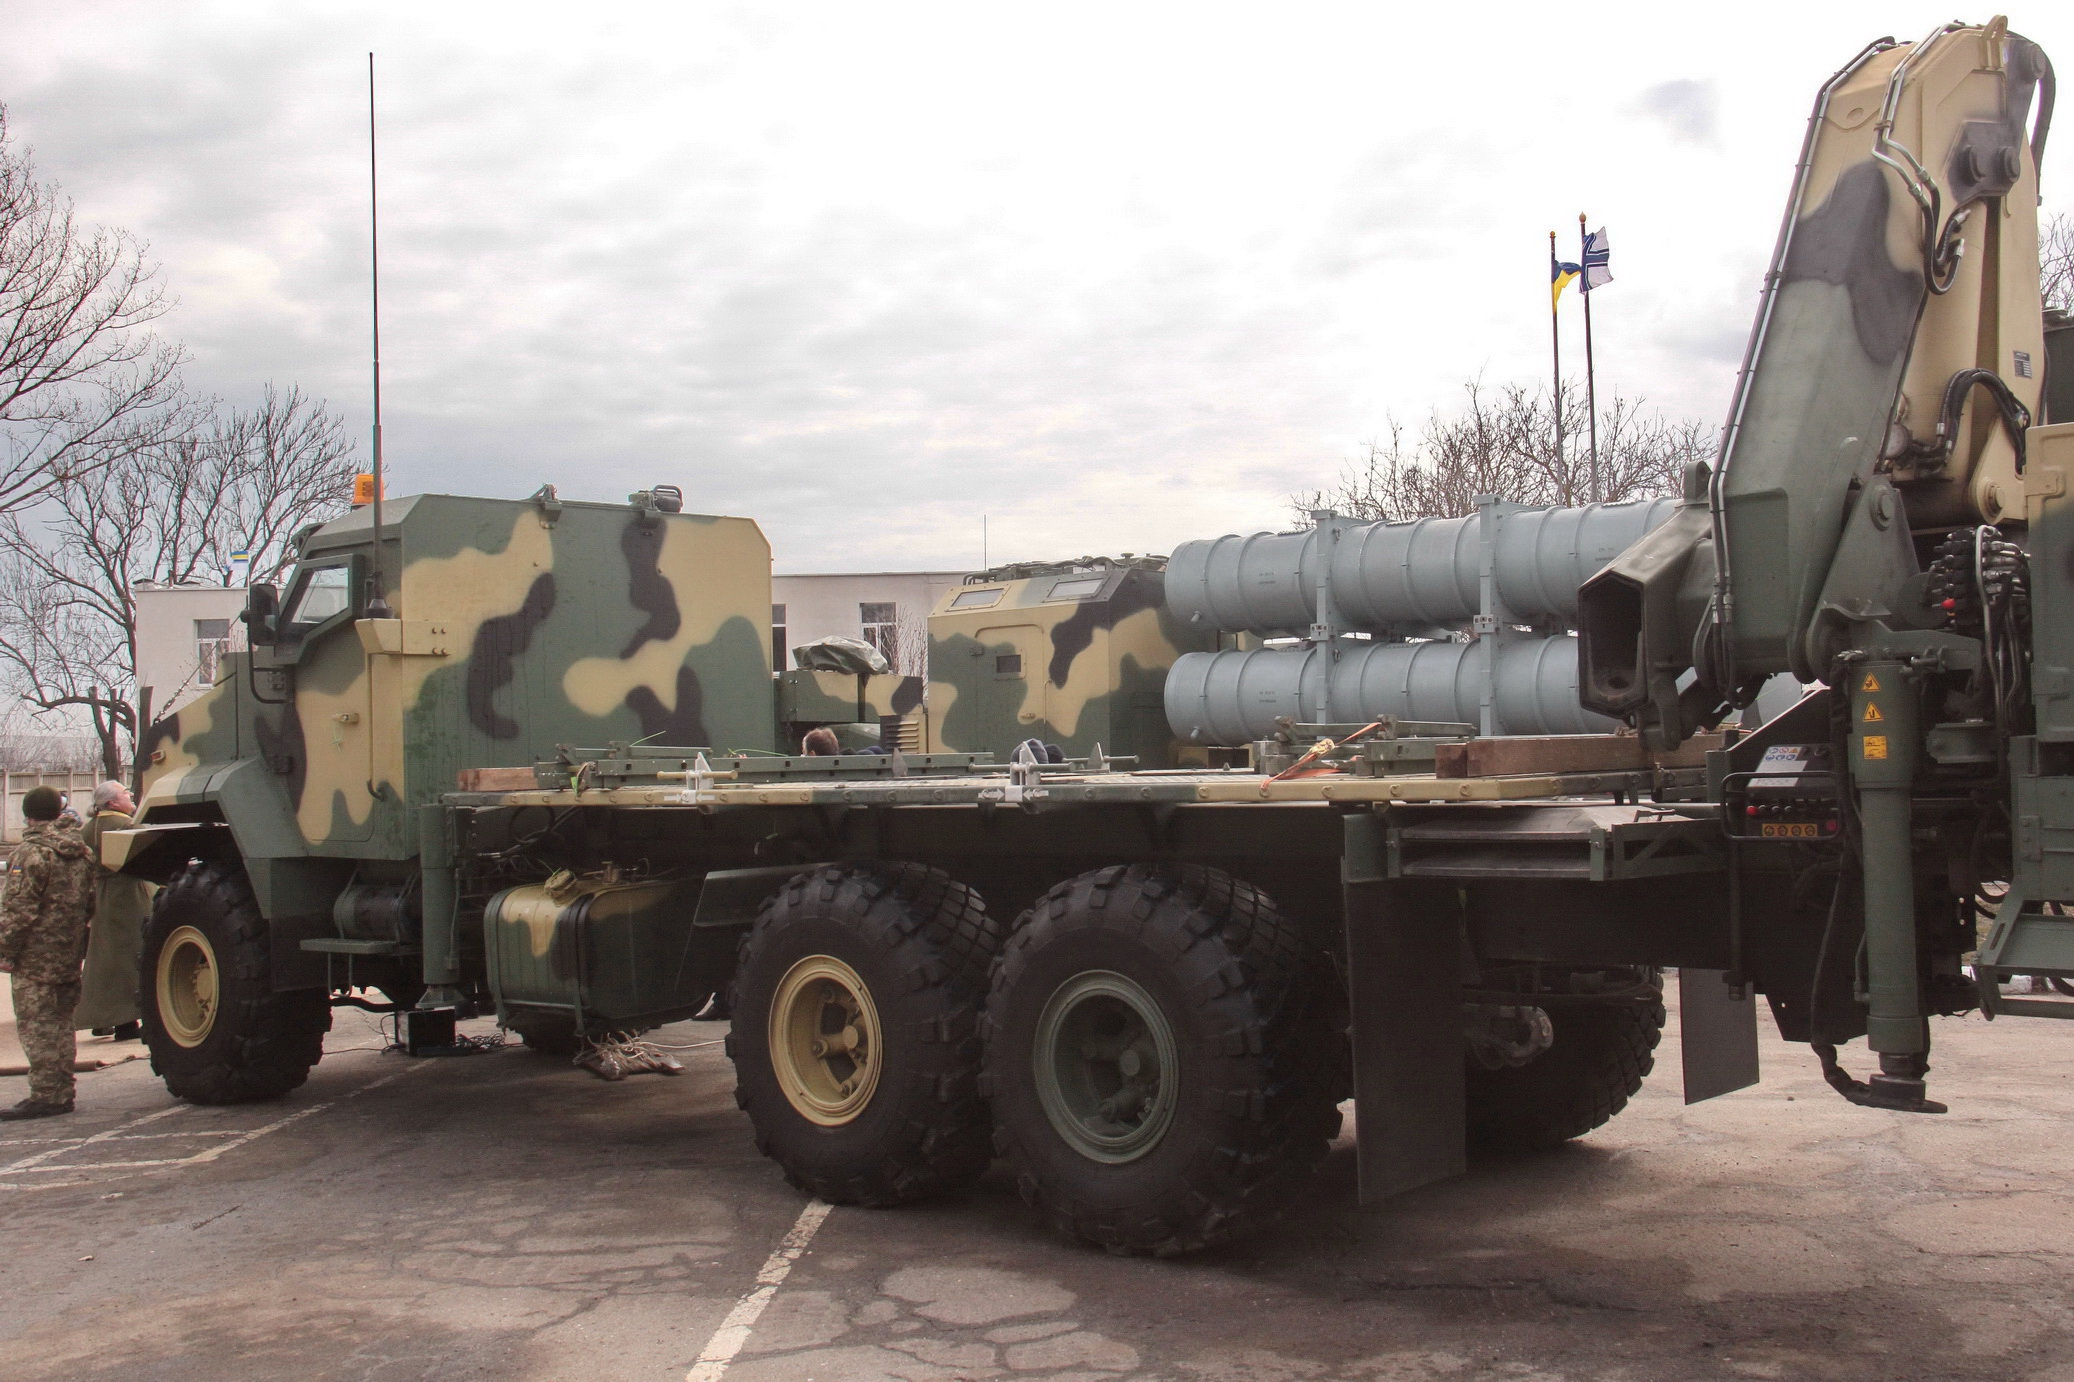 Передача ракетного комплекса «Нептун» ВМС